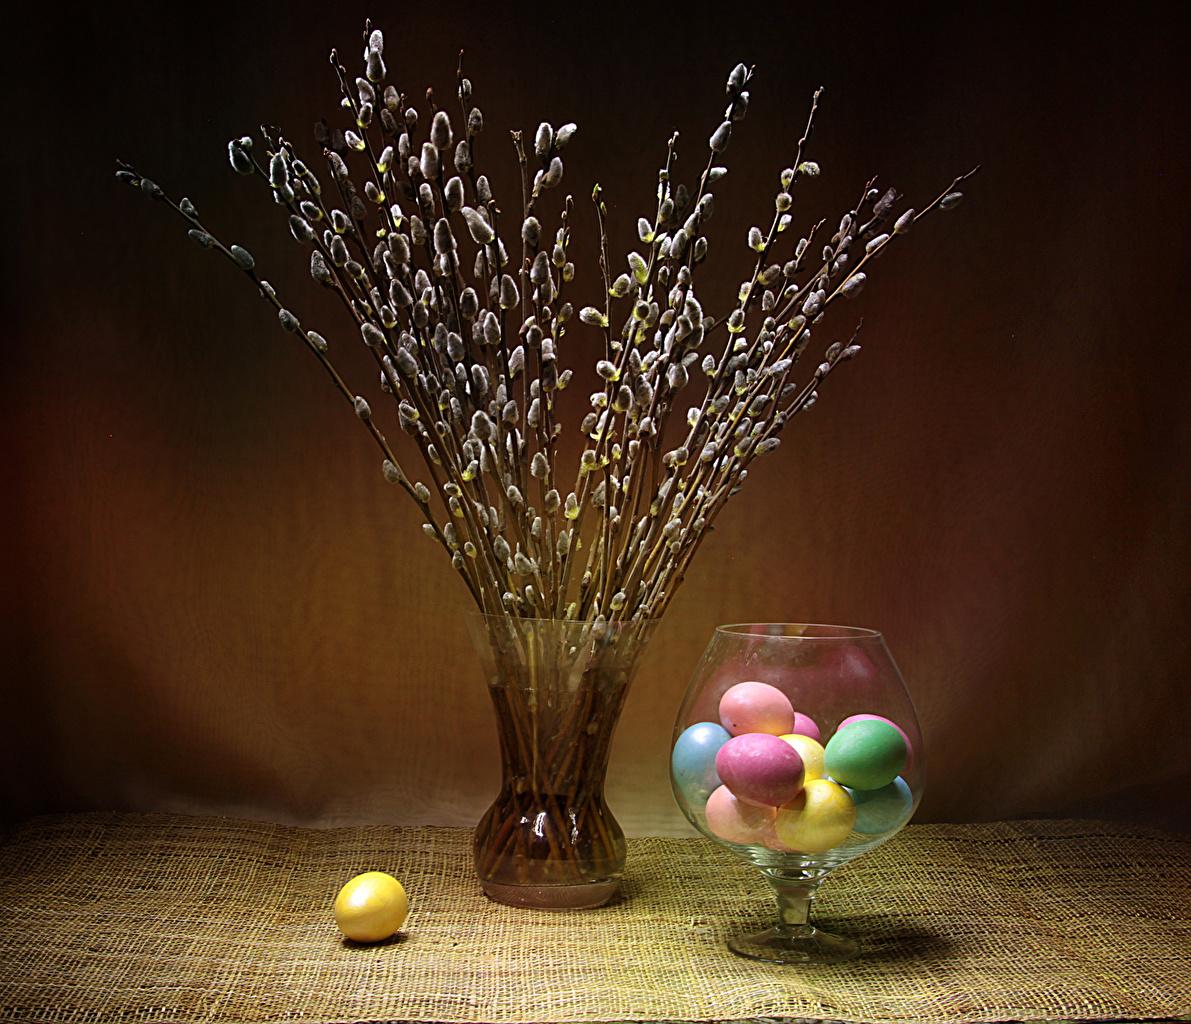 Wallpaper Easter Multicolor Eggs Vase Branches egg